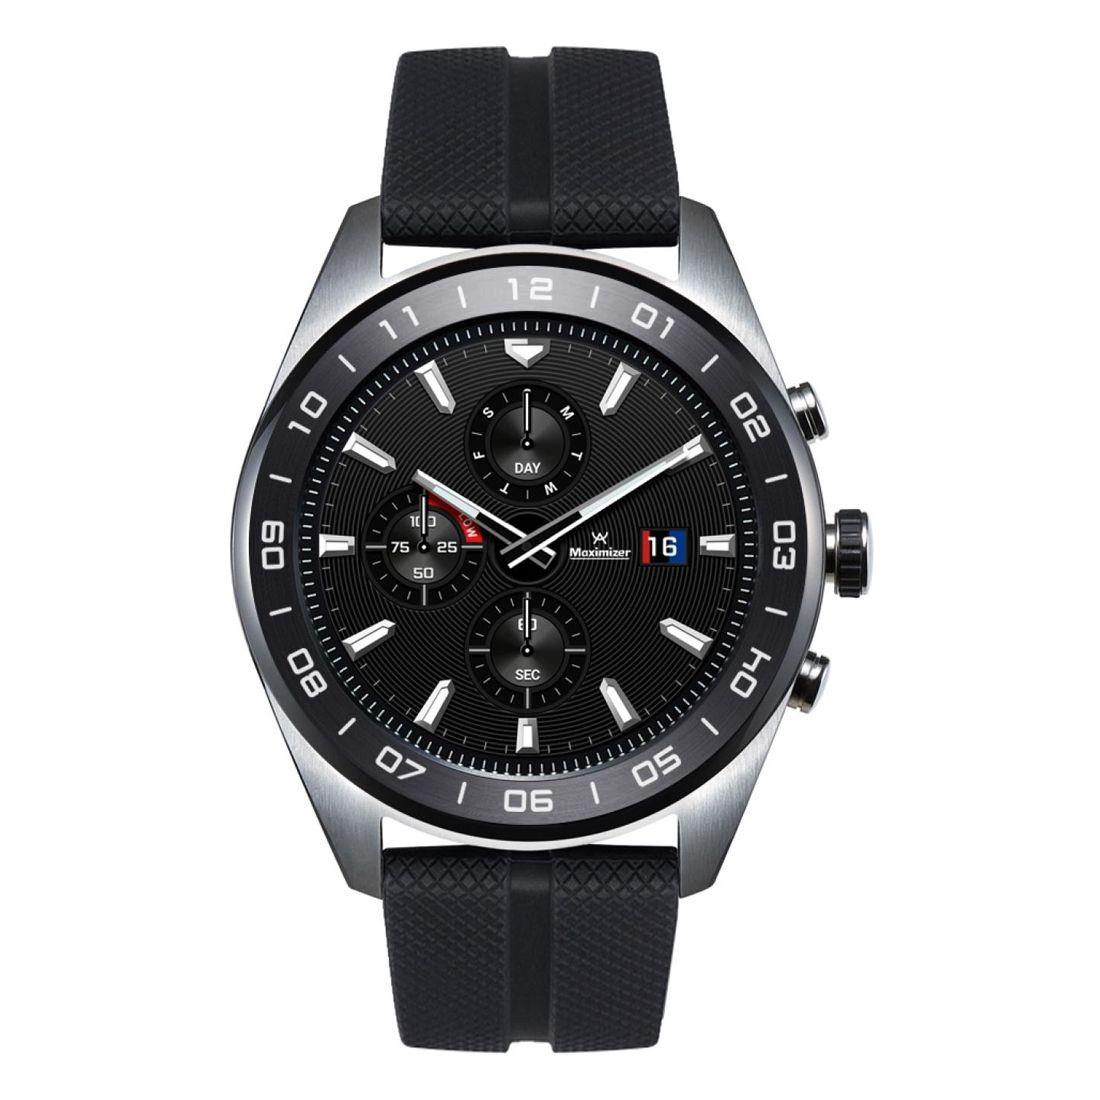 LG Watch W7 W315 Stainless Steel - Silver Black